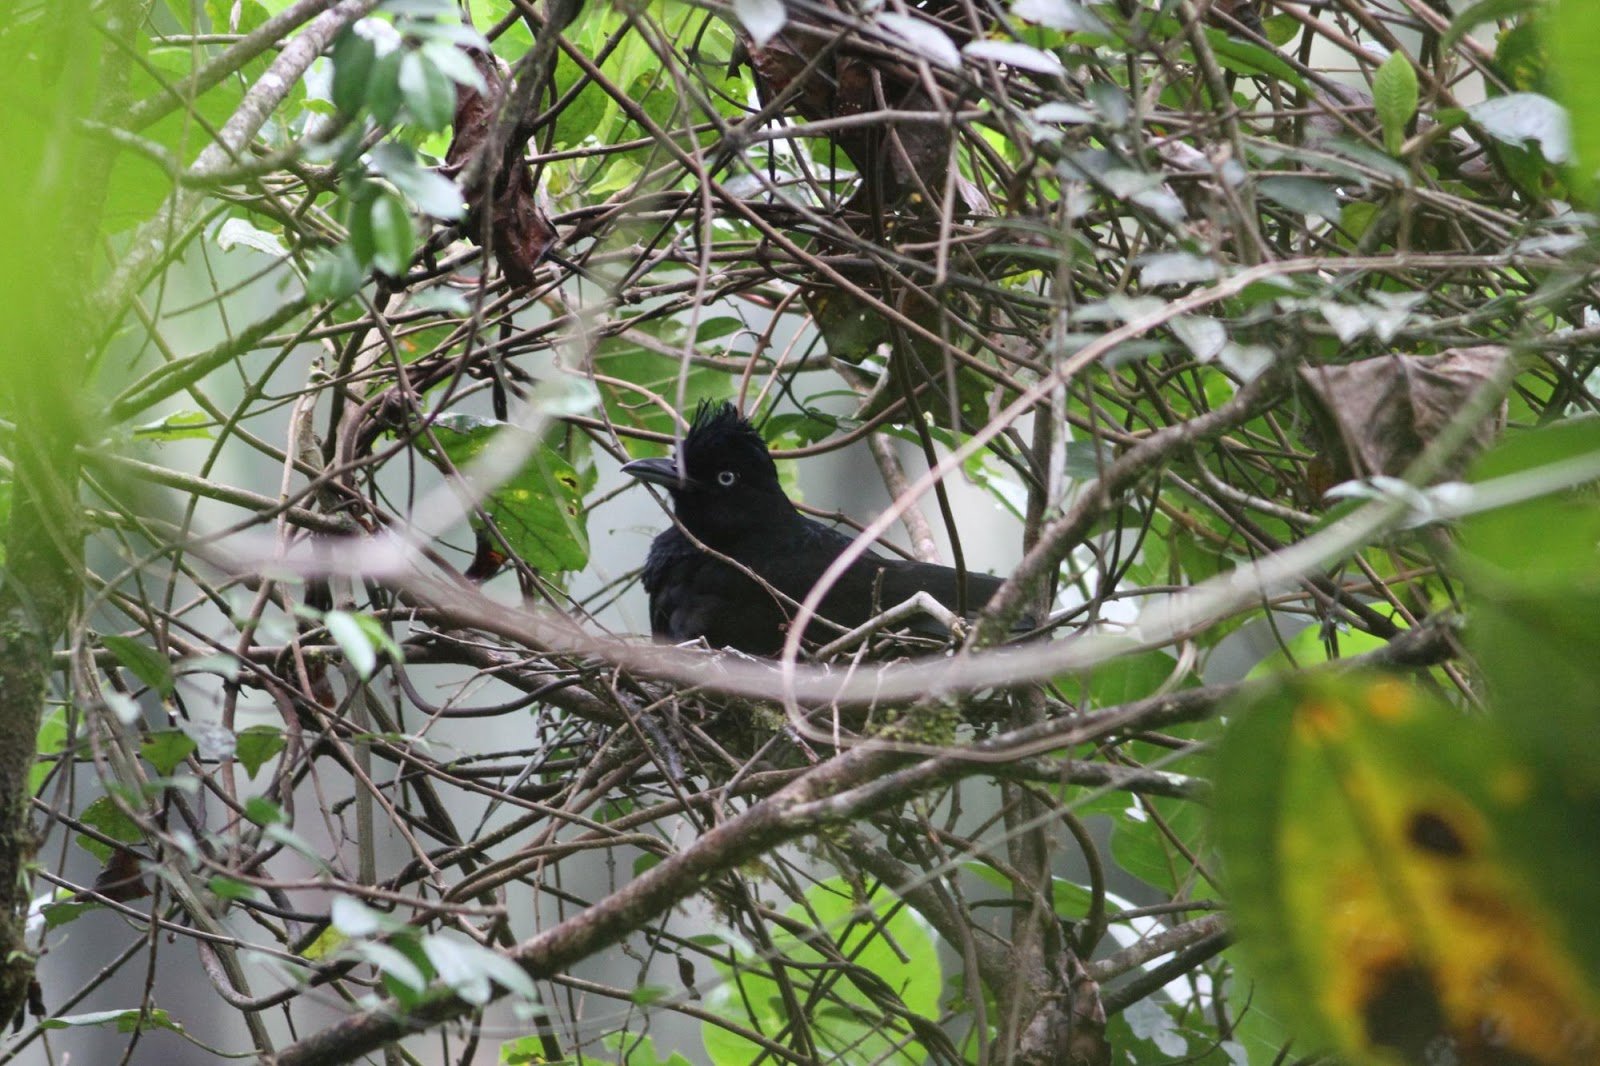 Tổ chim ô đen